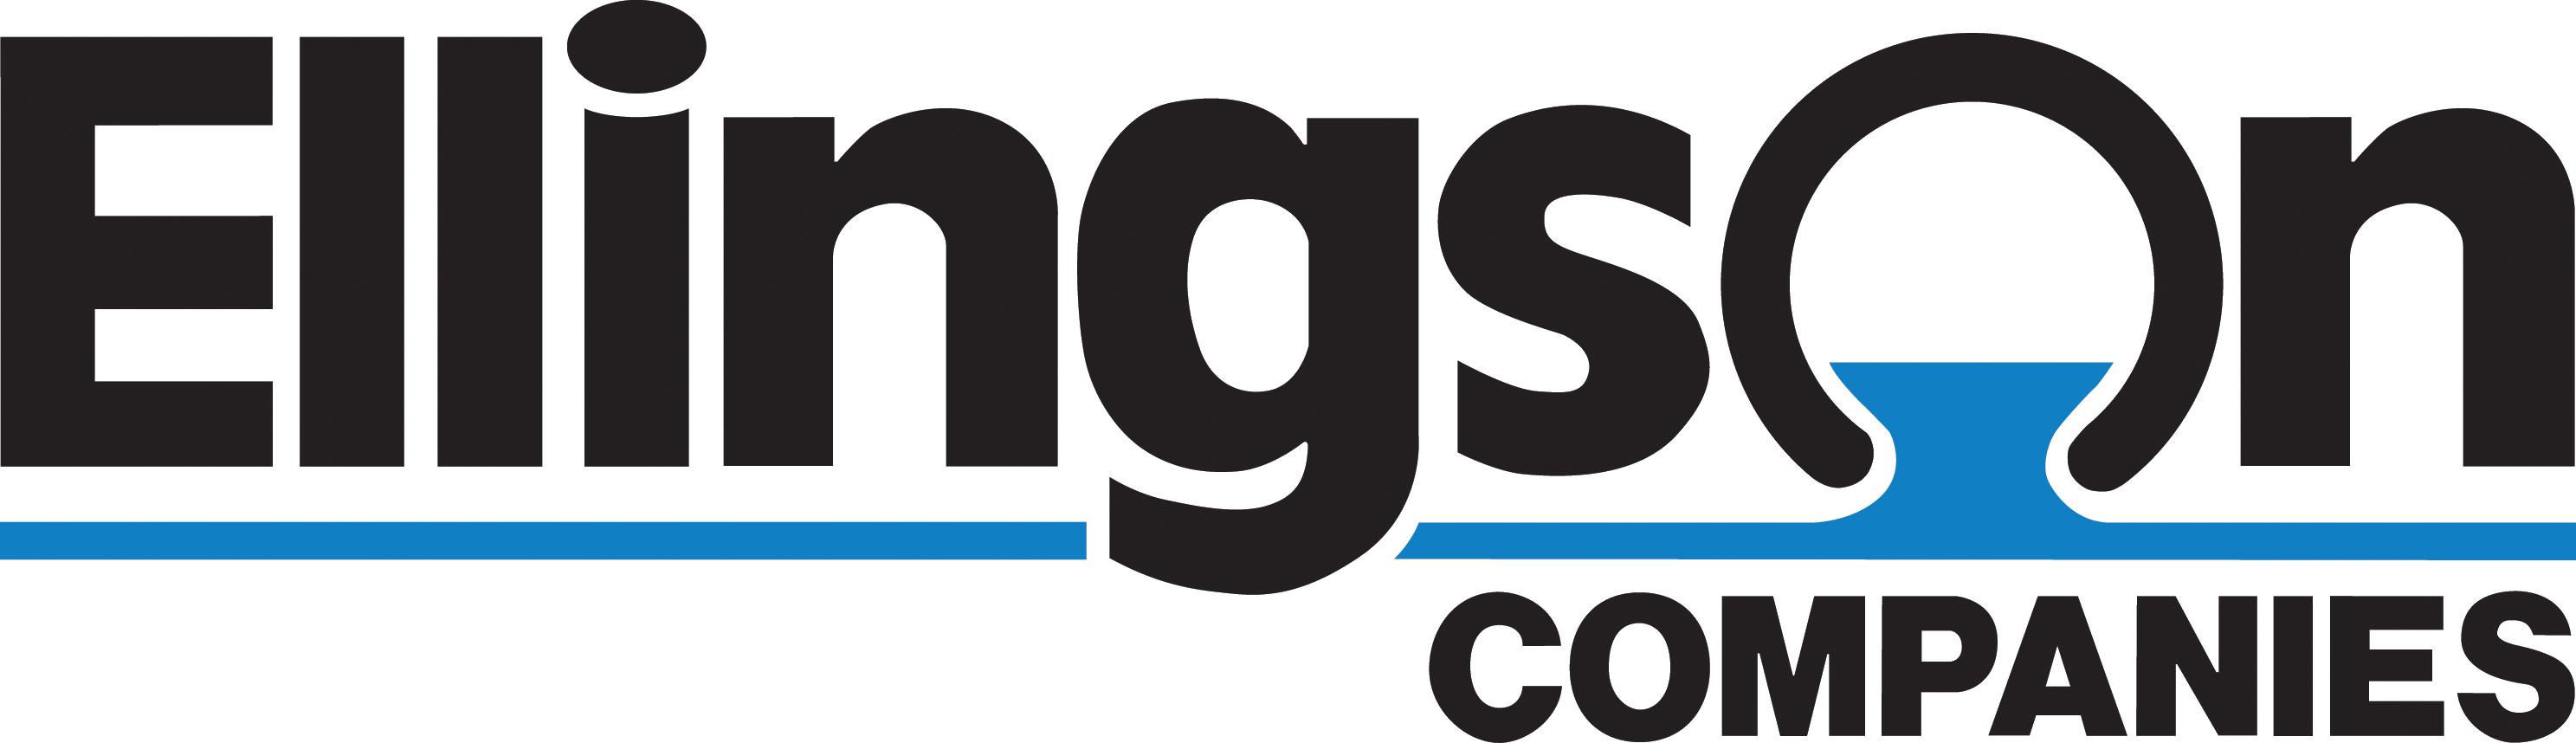 Ellingson Companies